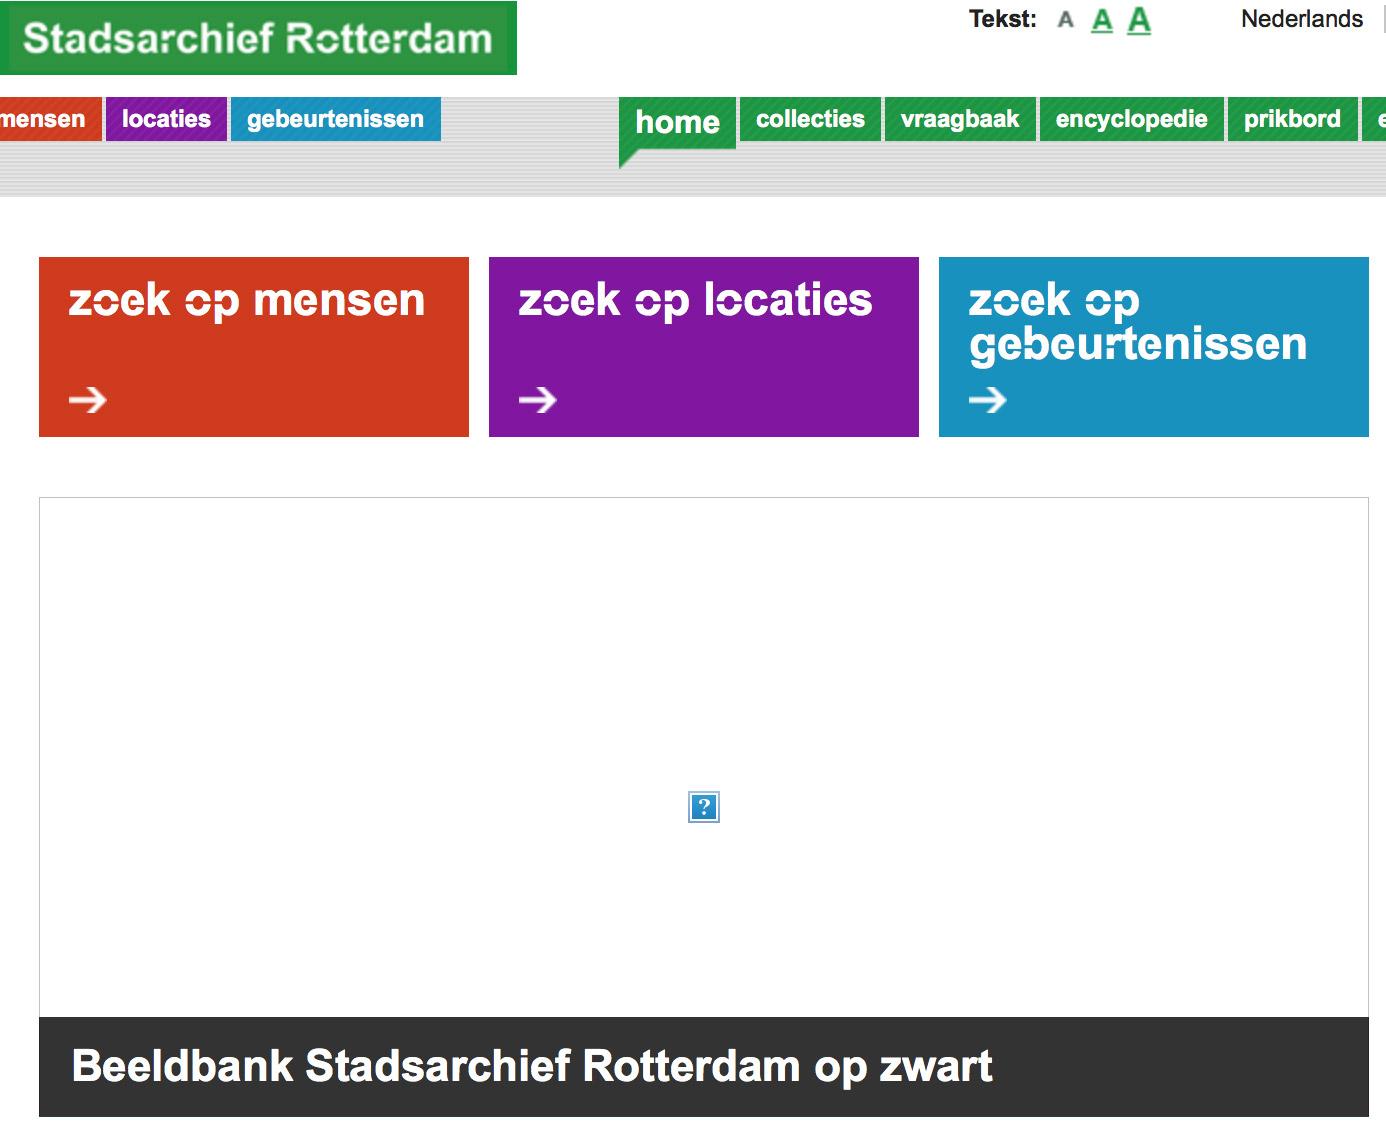 Stadsarchief Rotterdam haalt na vonnis alle beelden van site